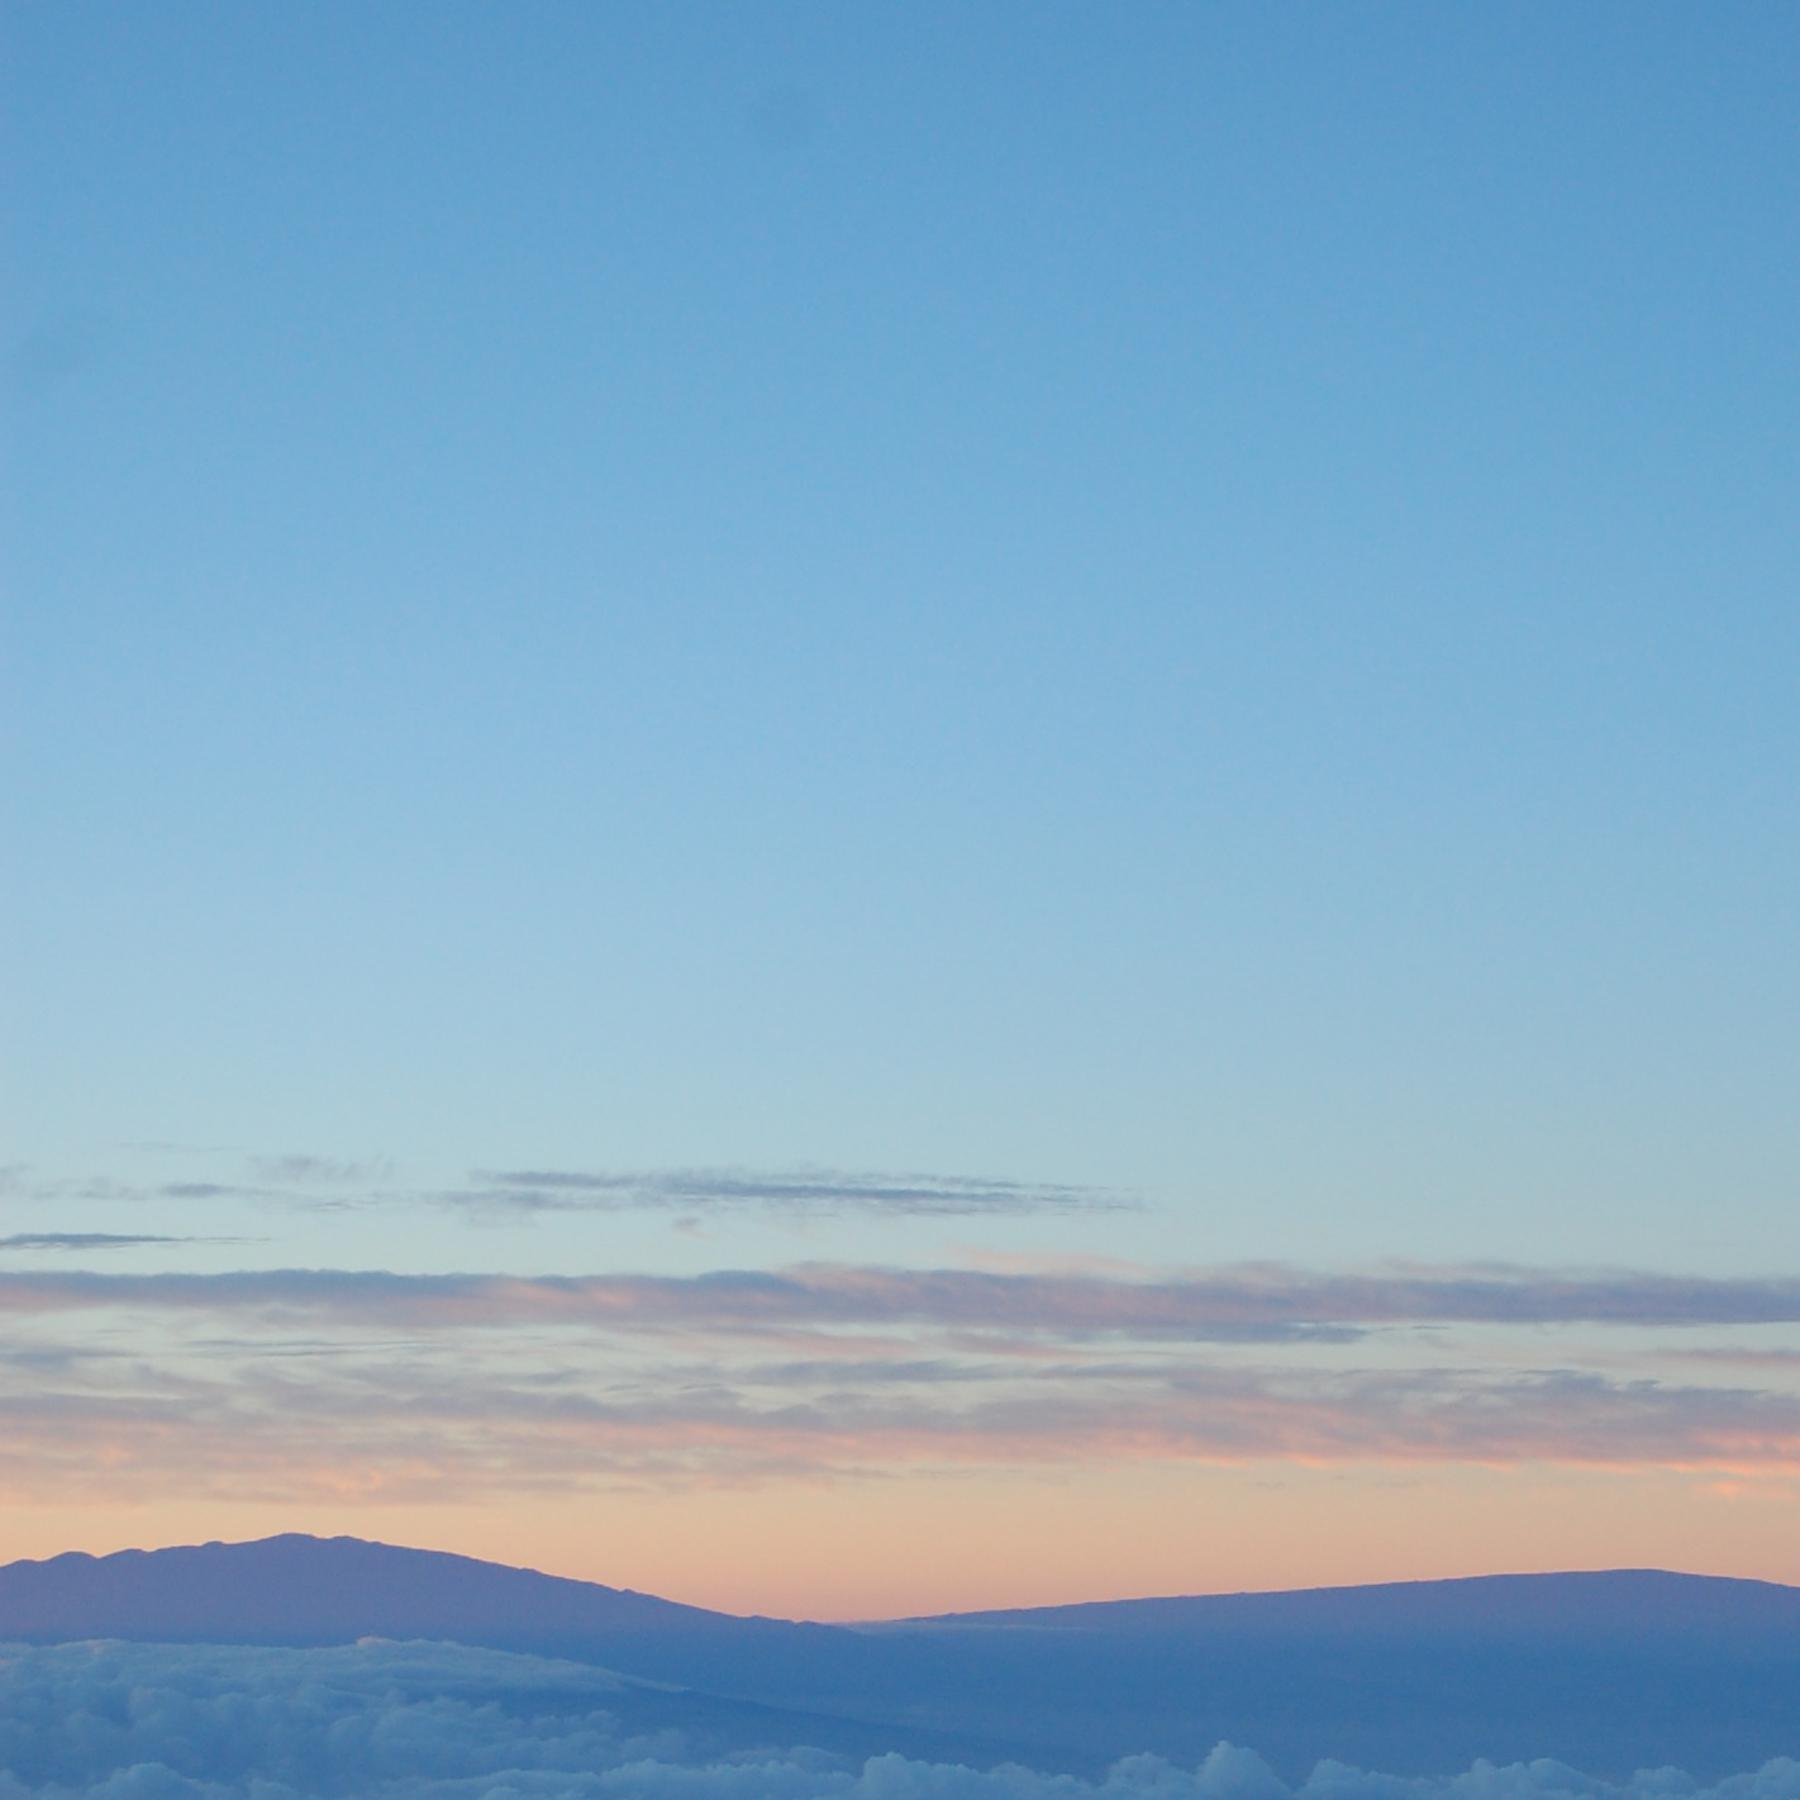 A clear morning sky.